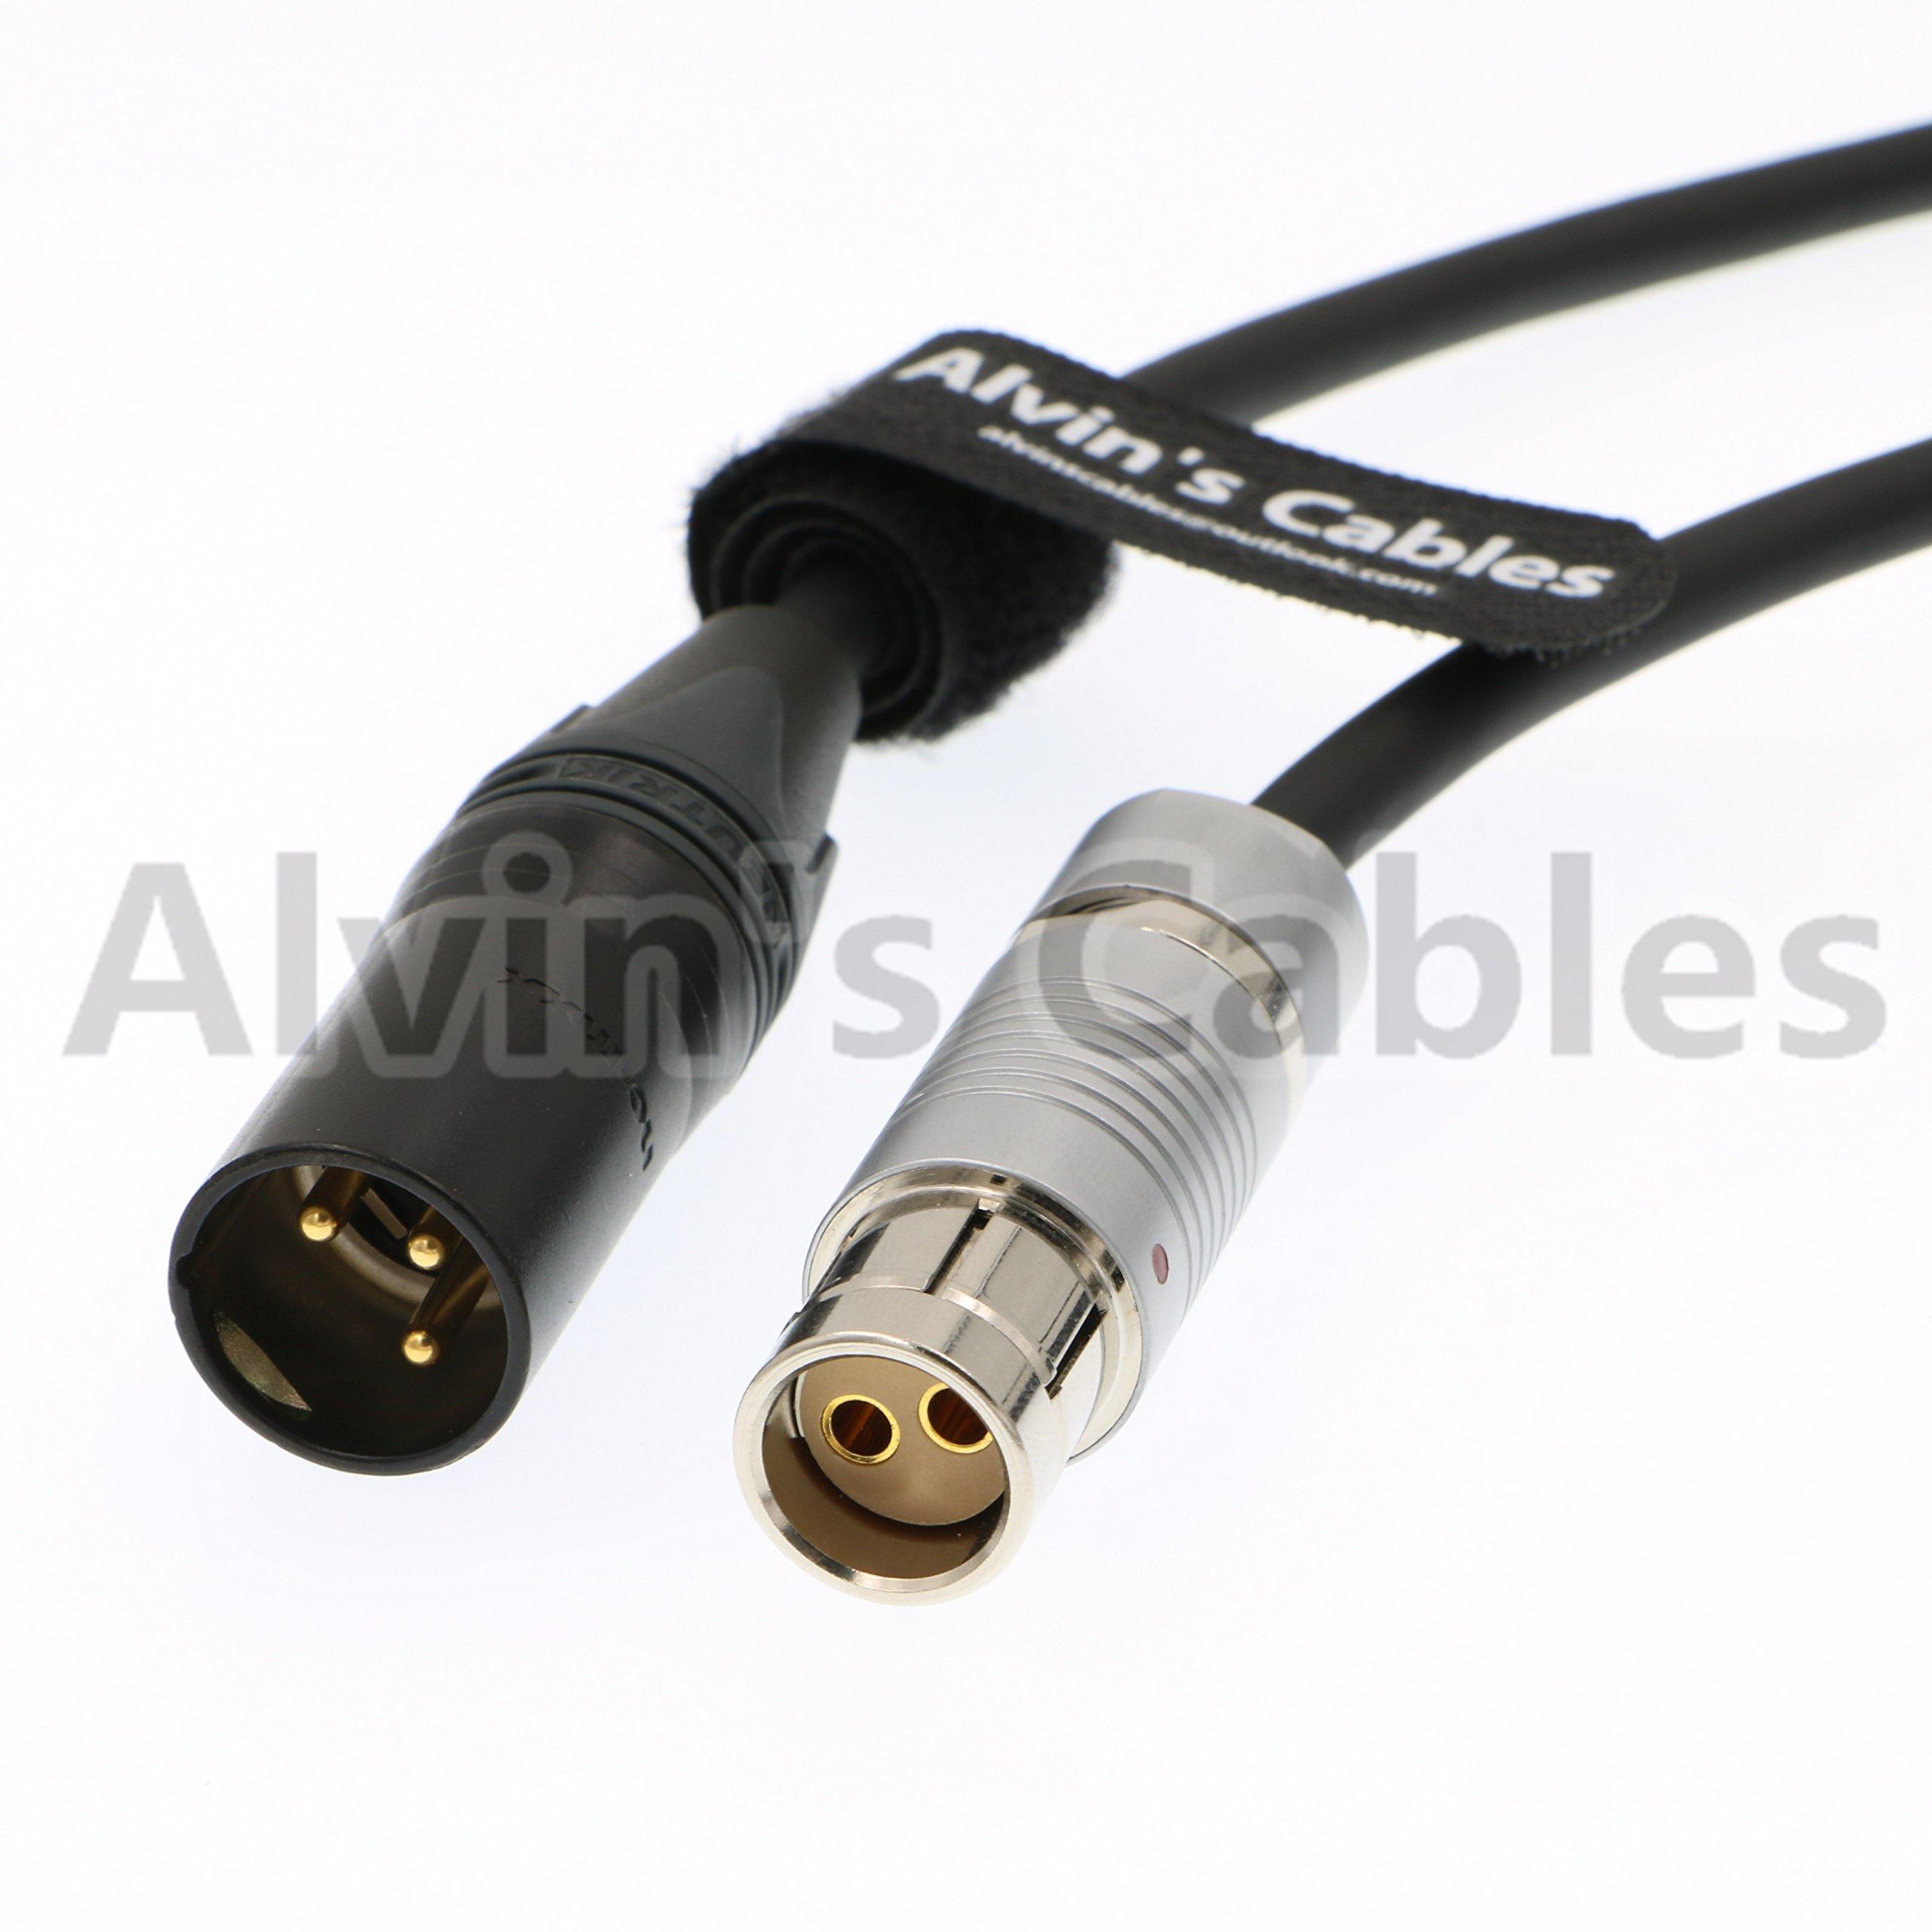 Alvin's Cables ARRI Alexa XT SXT Cameras Power Cable Fischer 2 pin Female to XLR 3 pin Male